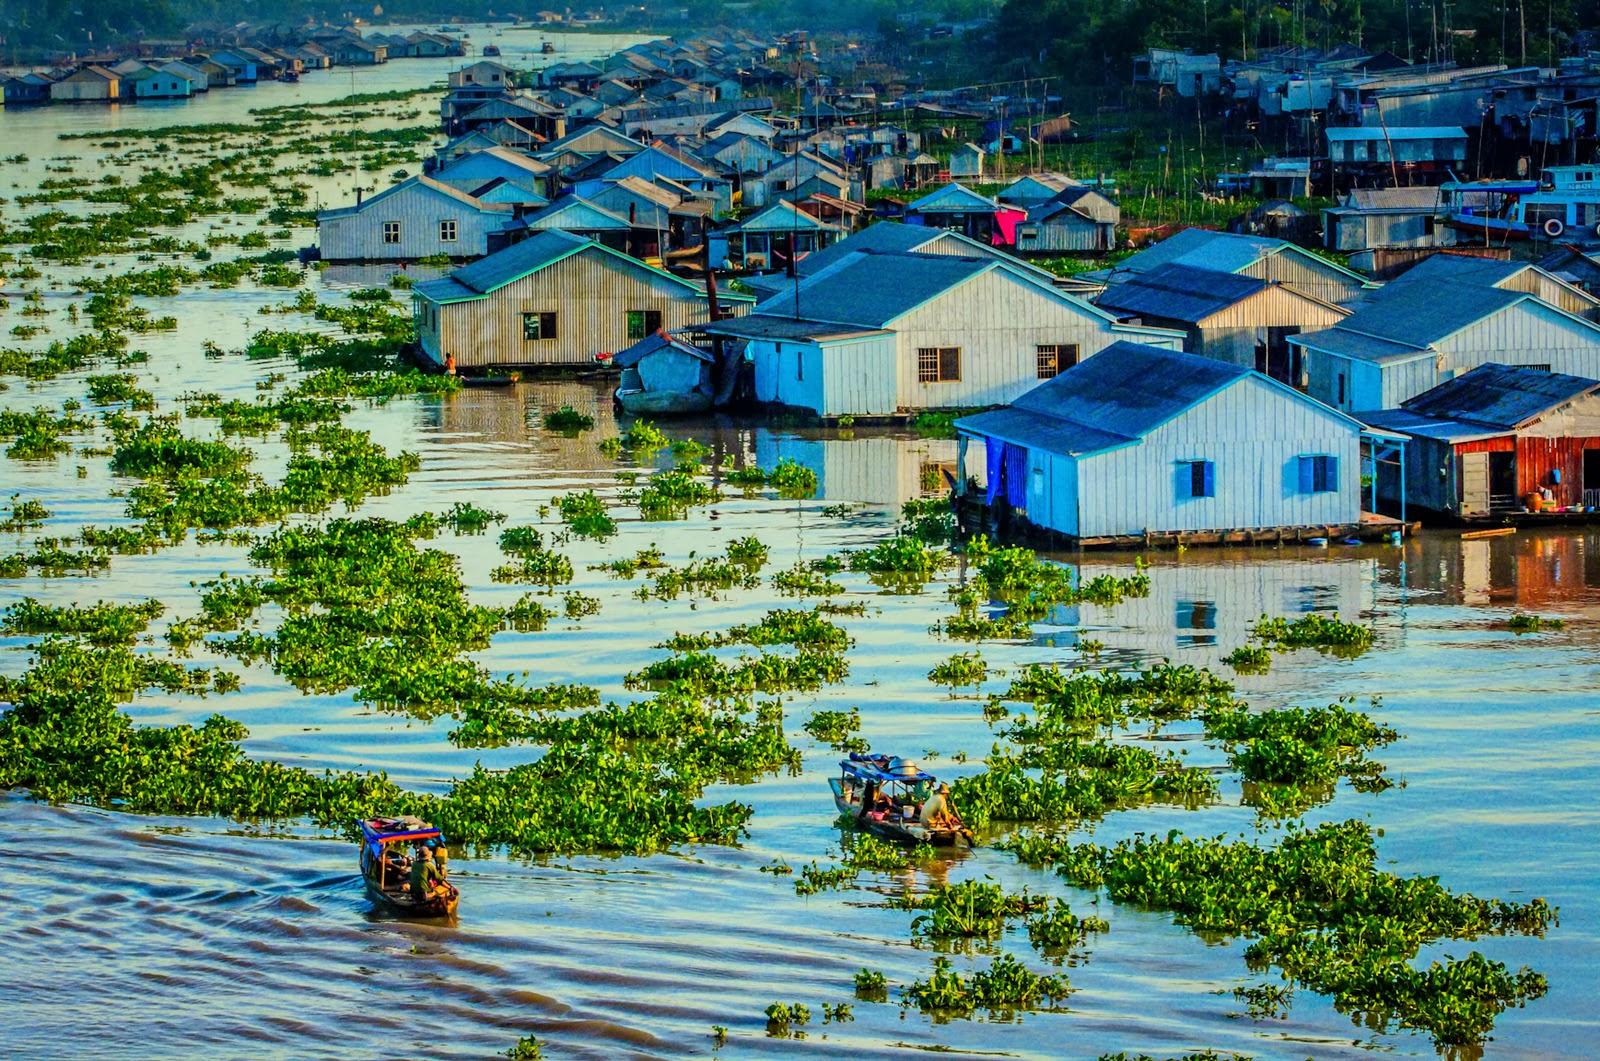 Floating houses in Mekong Delta